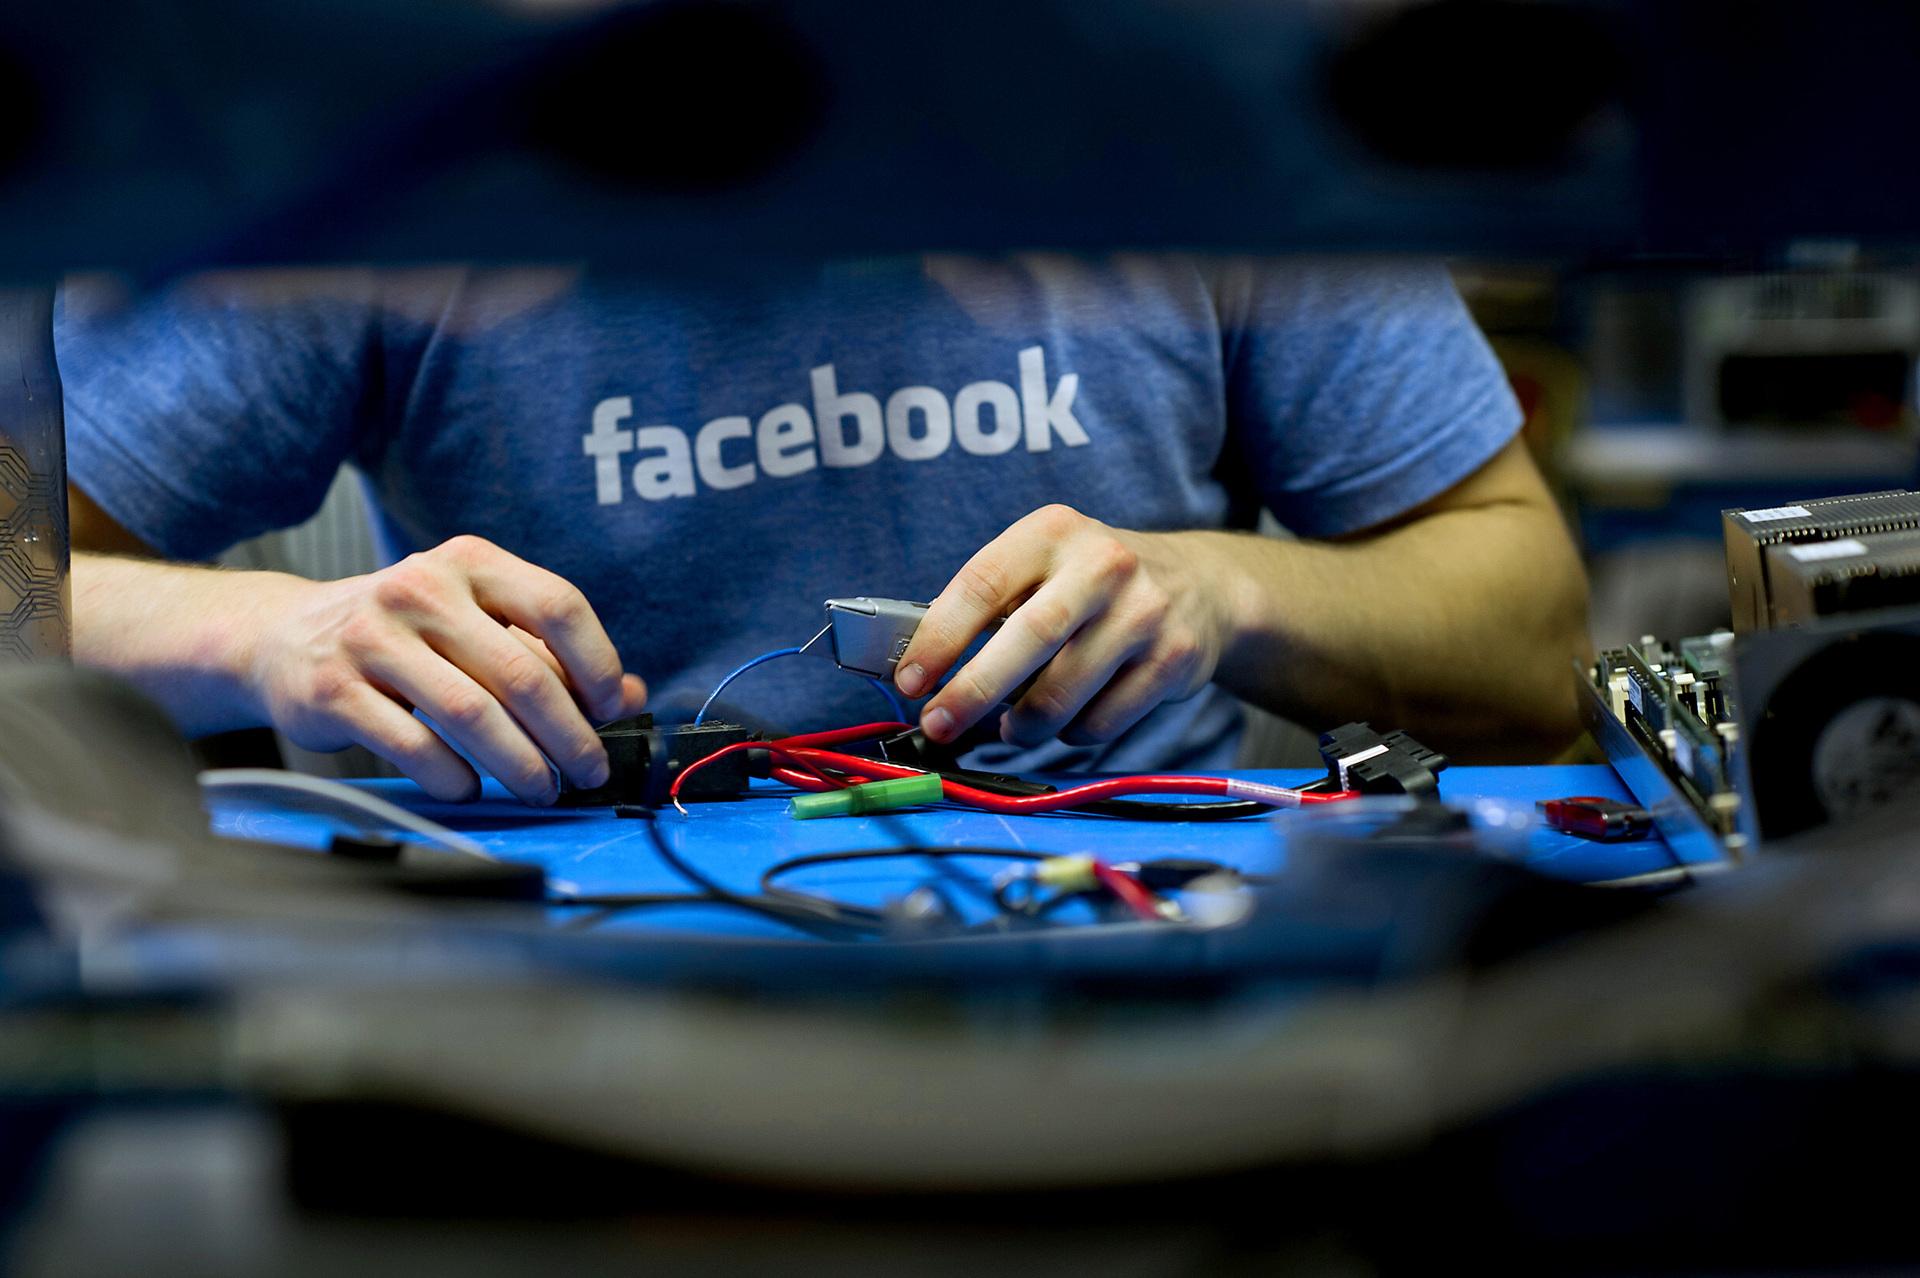 Facebook 神祕的另一面:擁有170人的硬體部門,是擴增實境公司 Oculus 選擇賣給臉書的一大原因